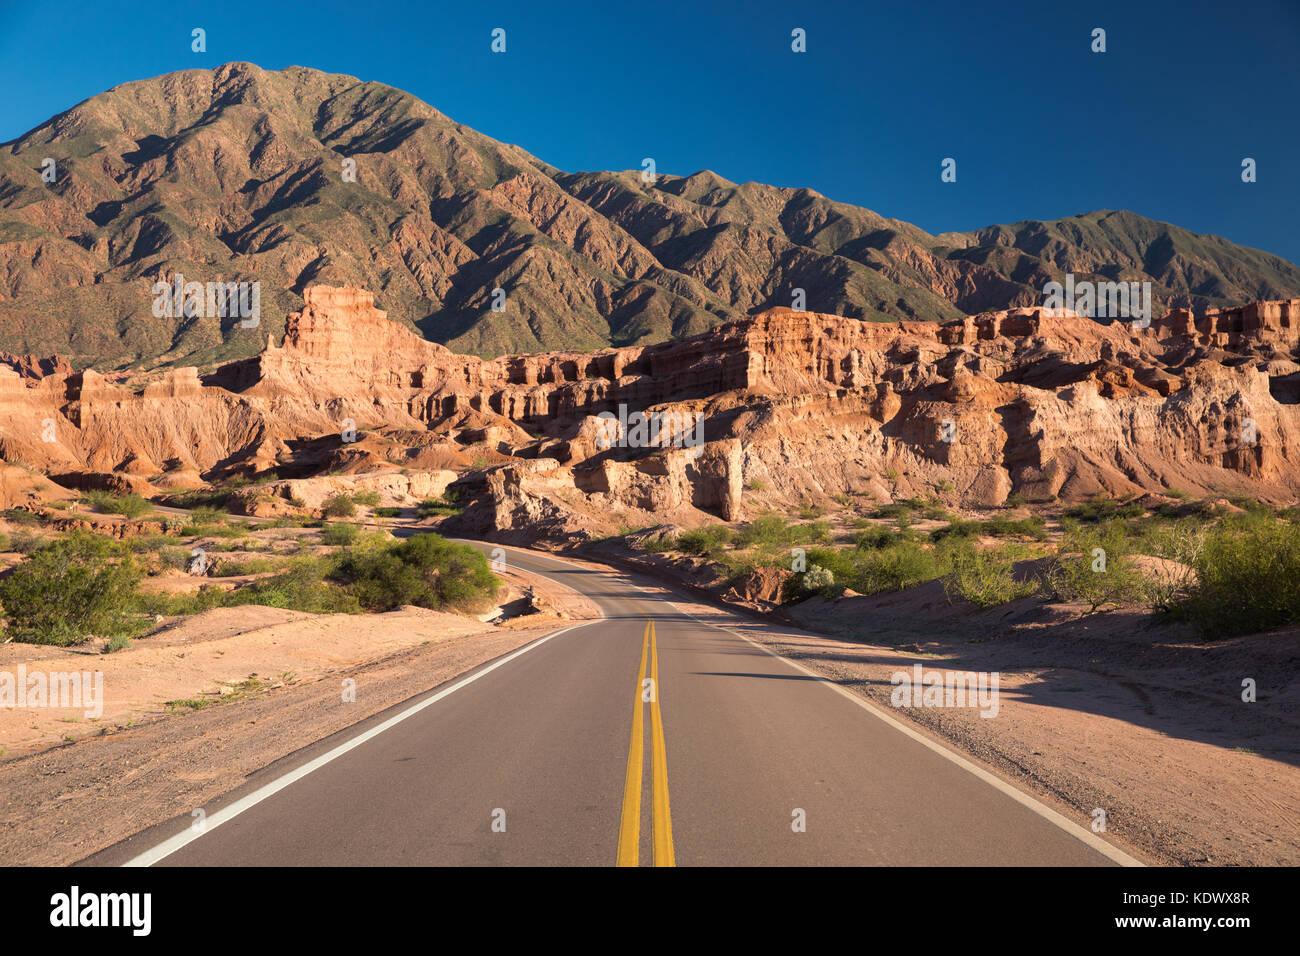 The road down the Quebrada de la Conches, Valles Calchaquies, Salta Province, Argentina - Stock Image